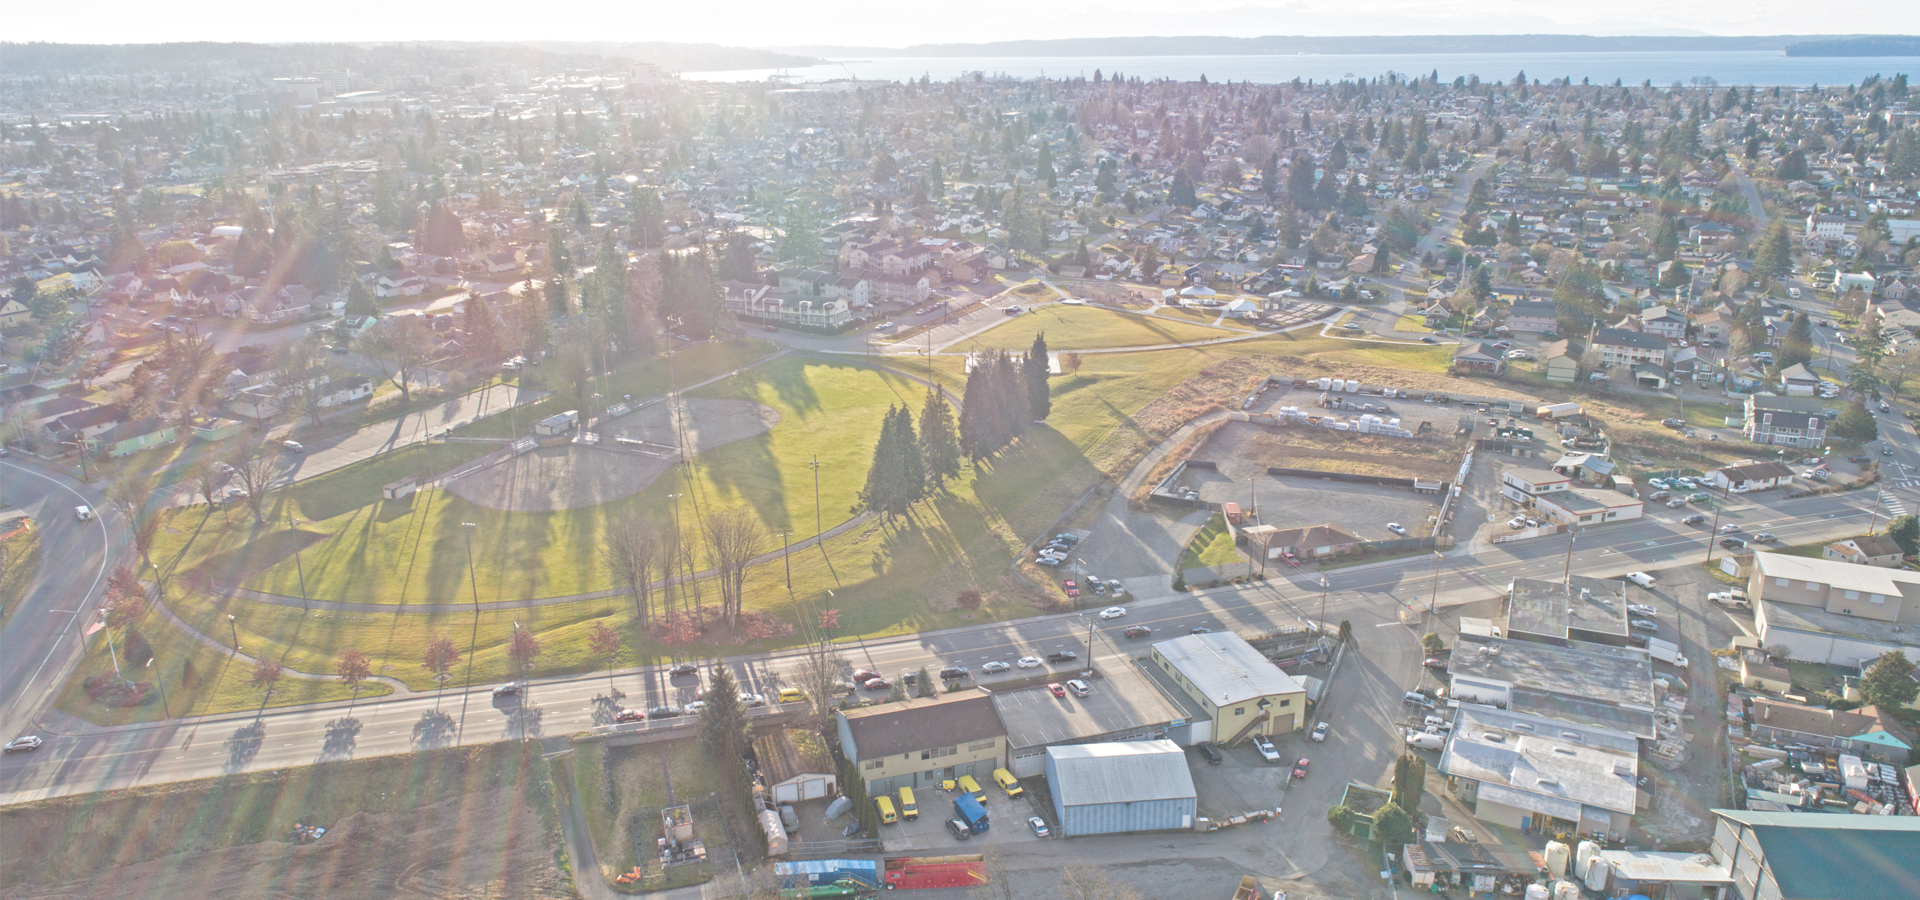 Peer-to-peer advisory in Everett, Washington, USA